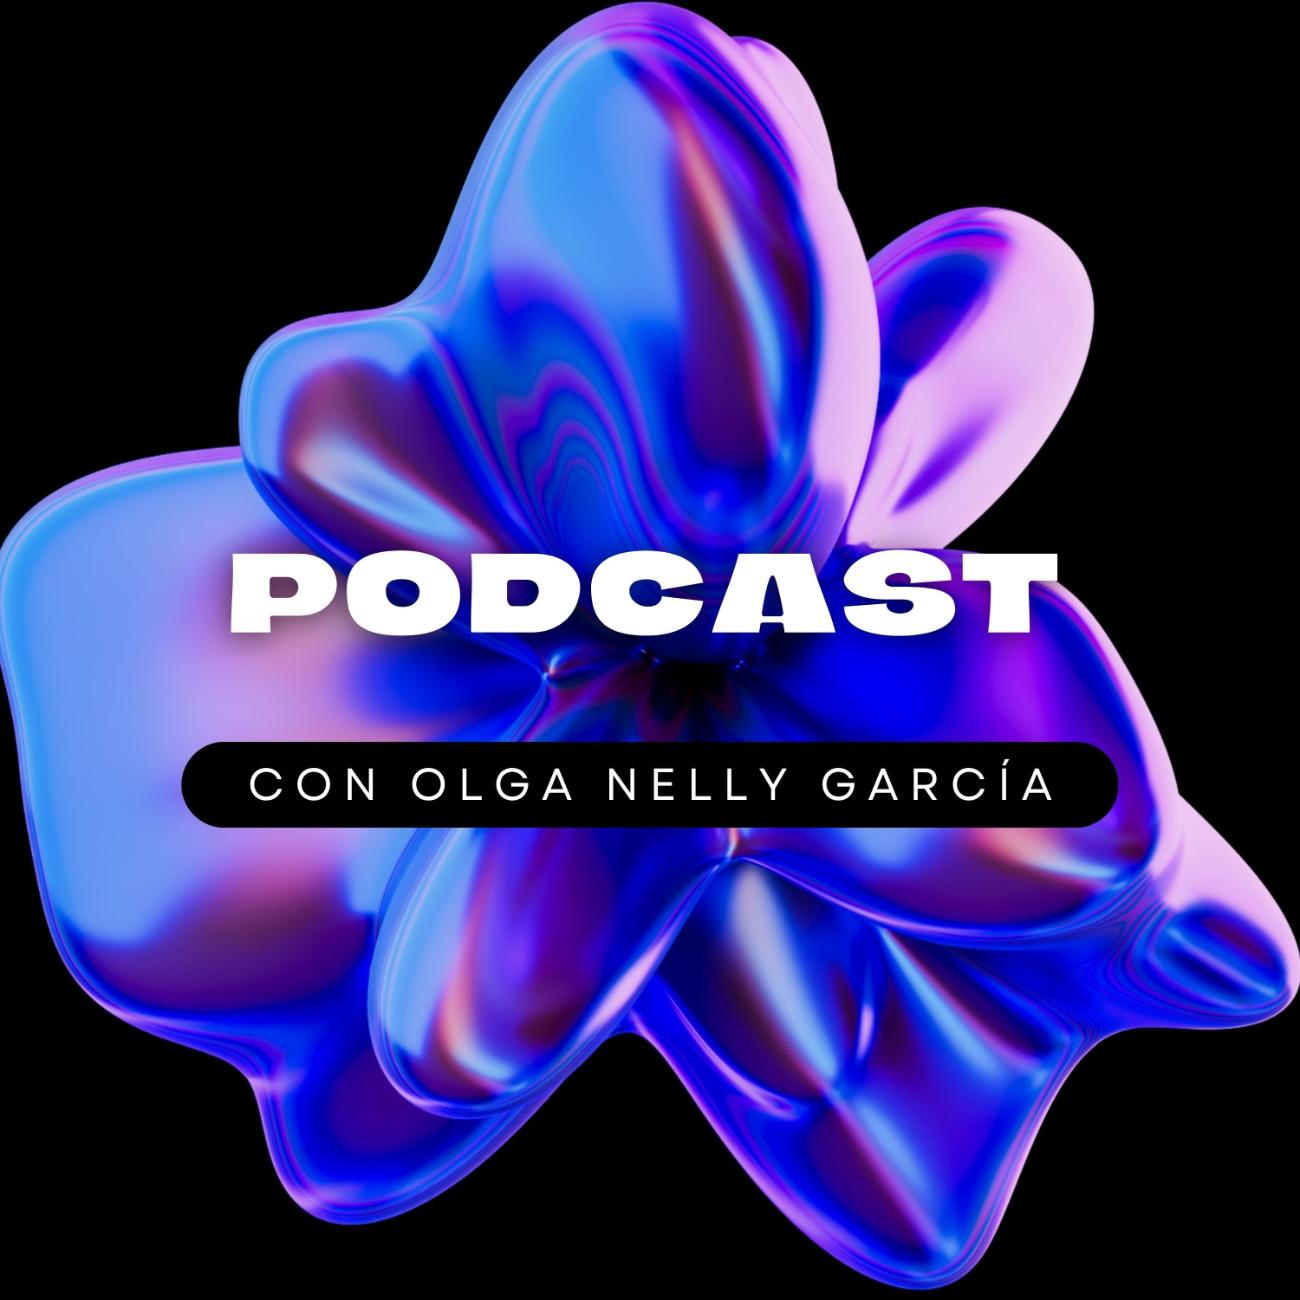 <![CDATA[Olga Nelly García. Programas de radio. (Podcast) - www.olganellygarcia.com]]>